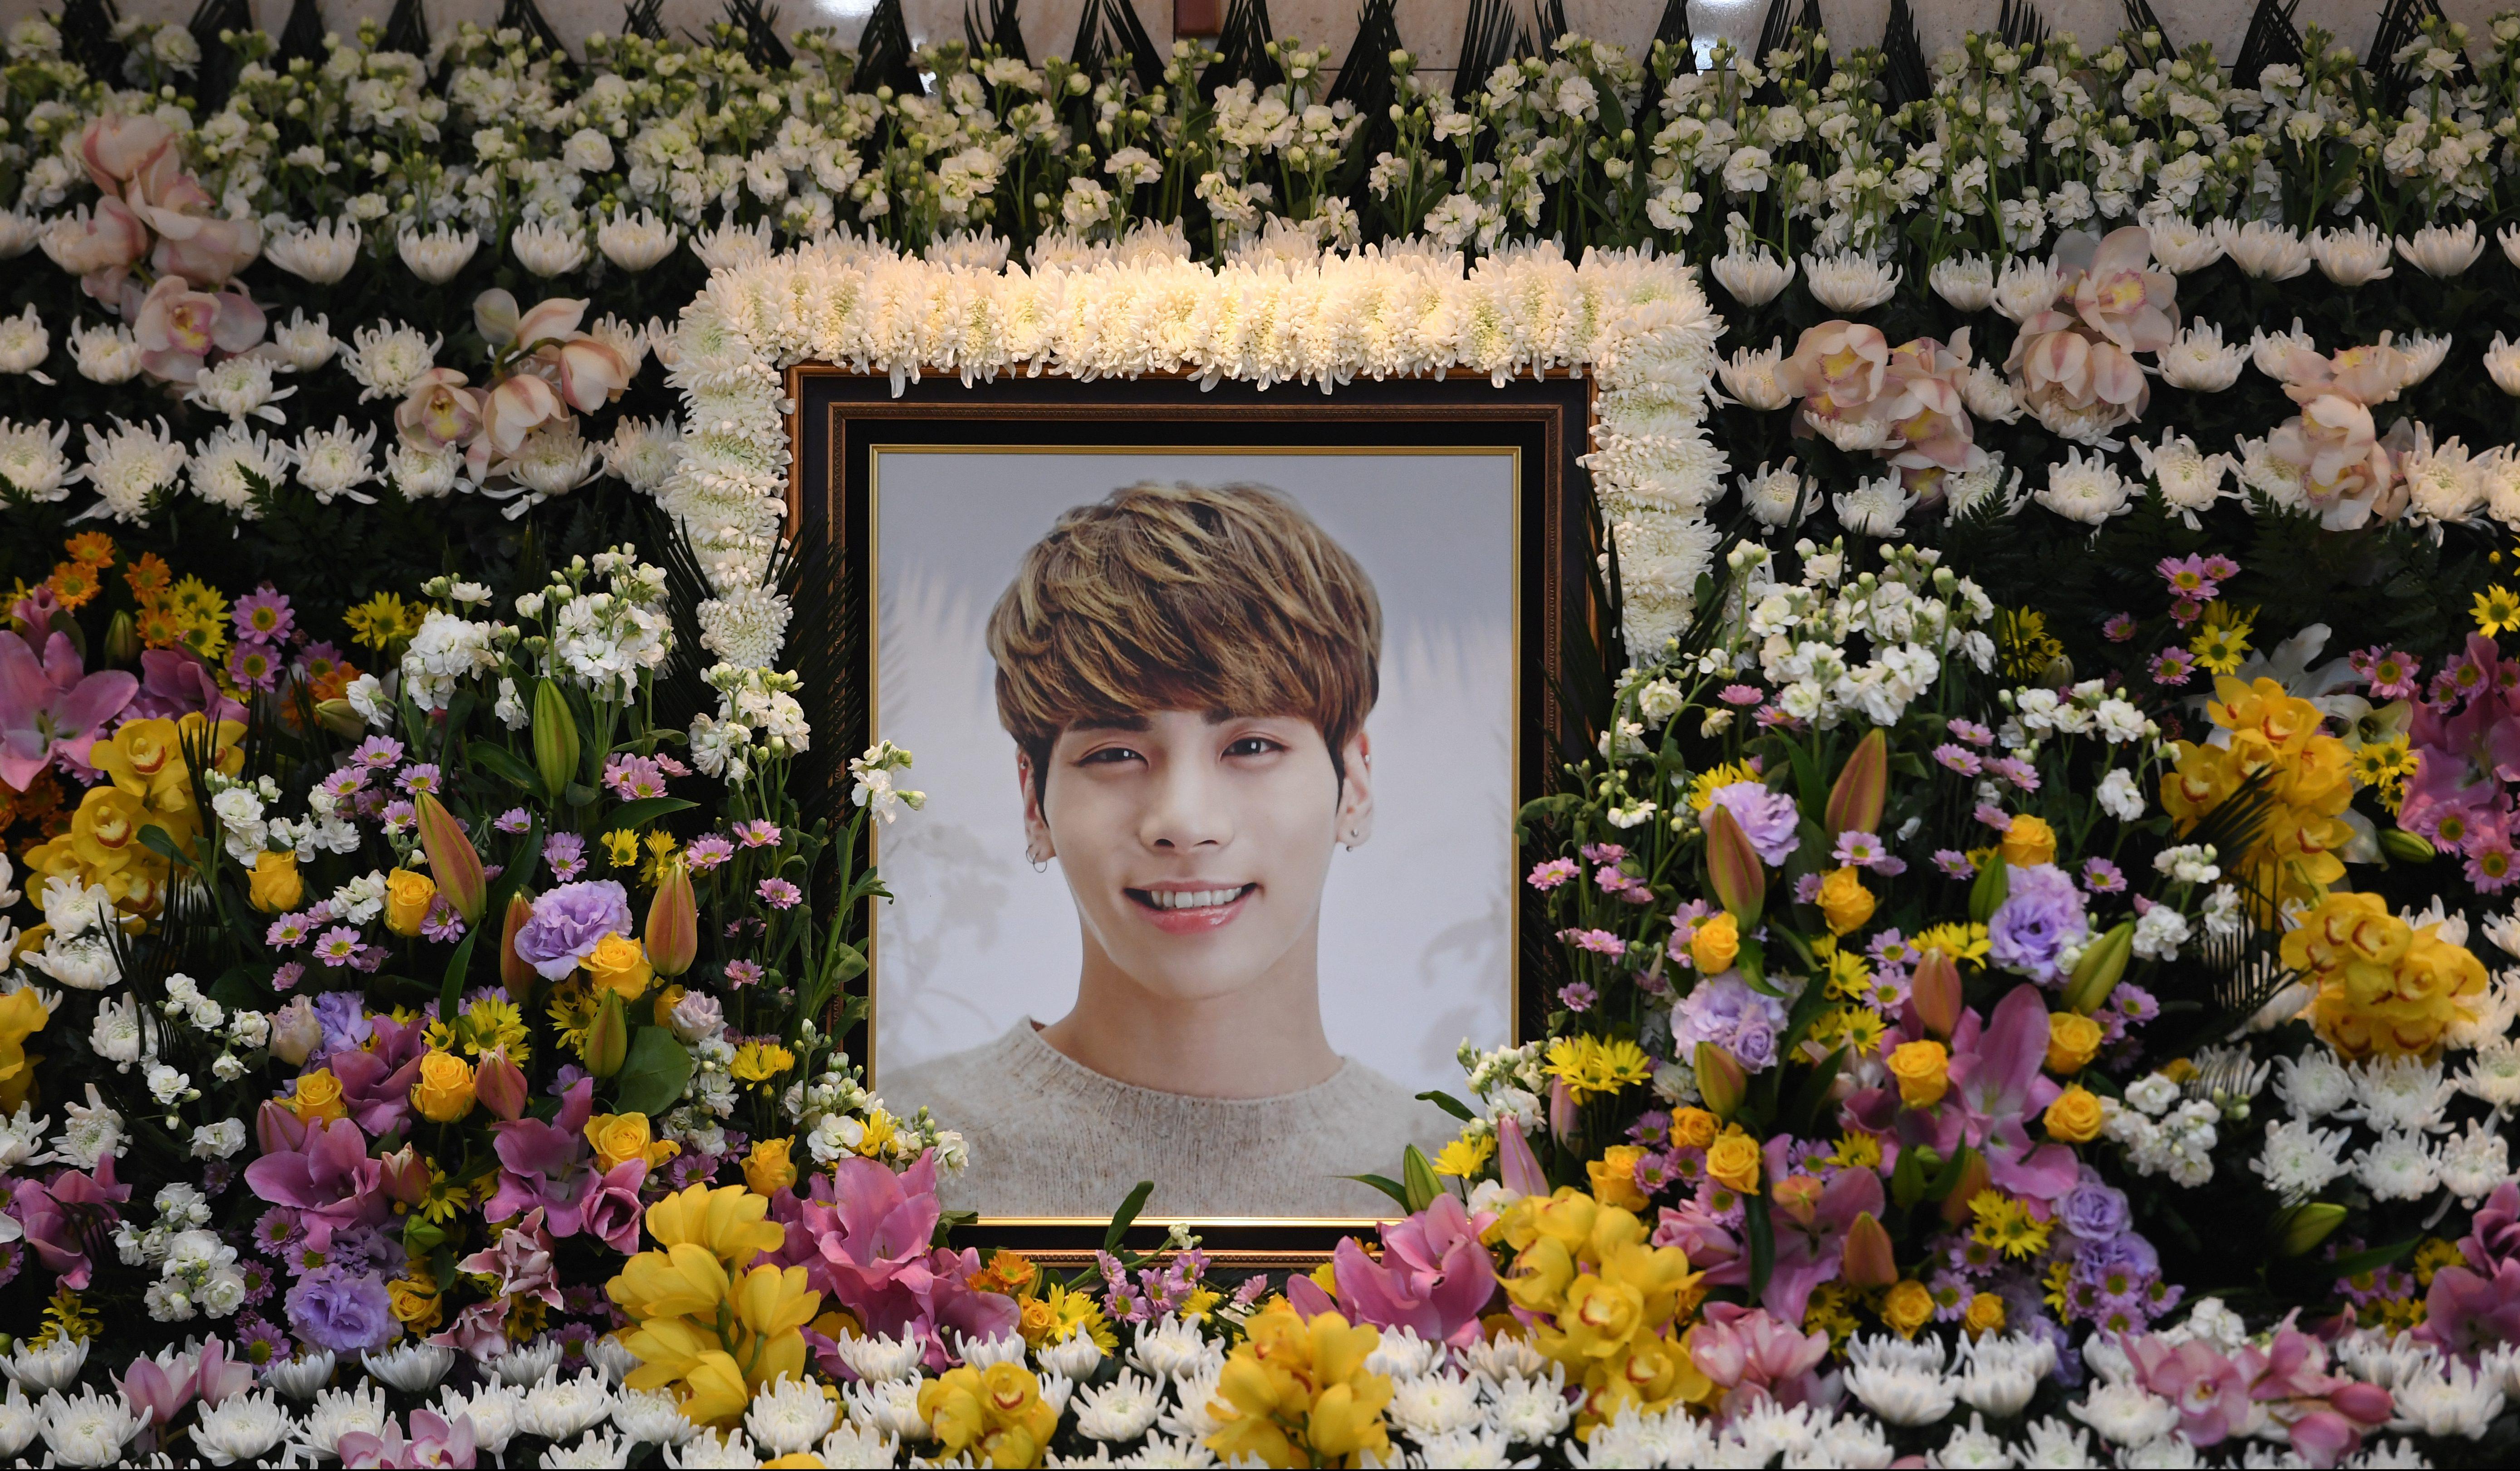 Suicide Of Shinee S Jonghyun Prompts Korea To Confront Grueling Kpop